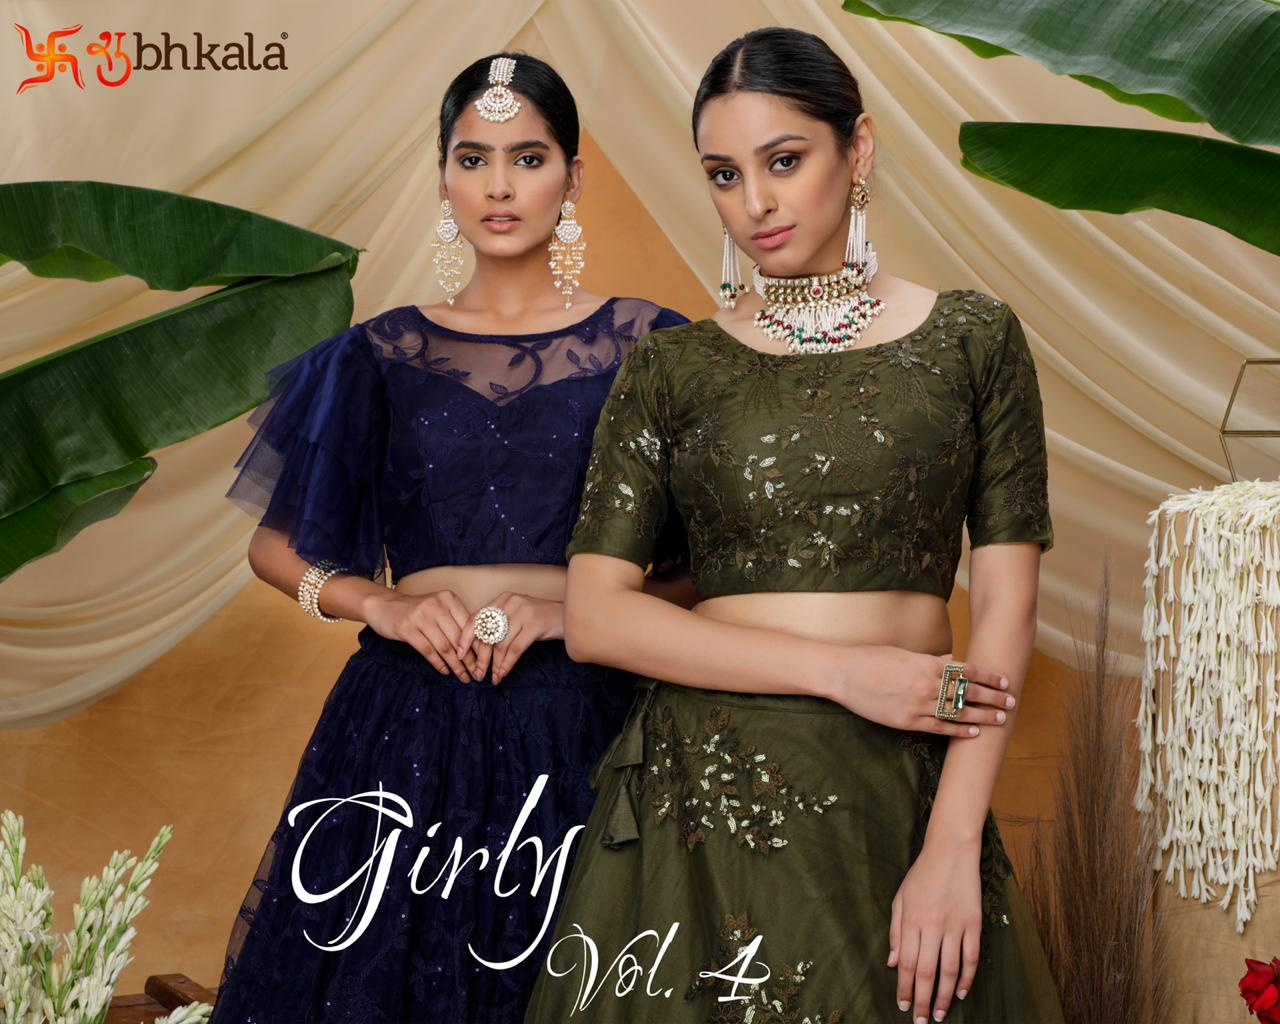 Girly Vol 5 by shubhkala lehenga designer wholesaler